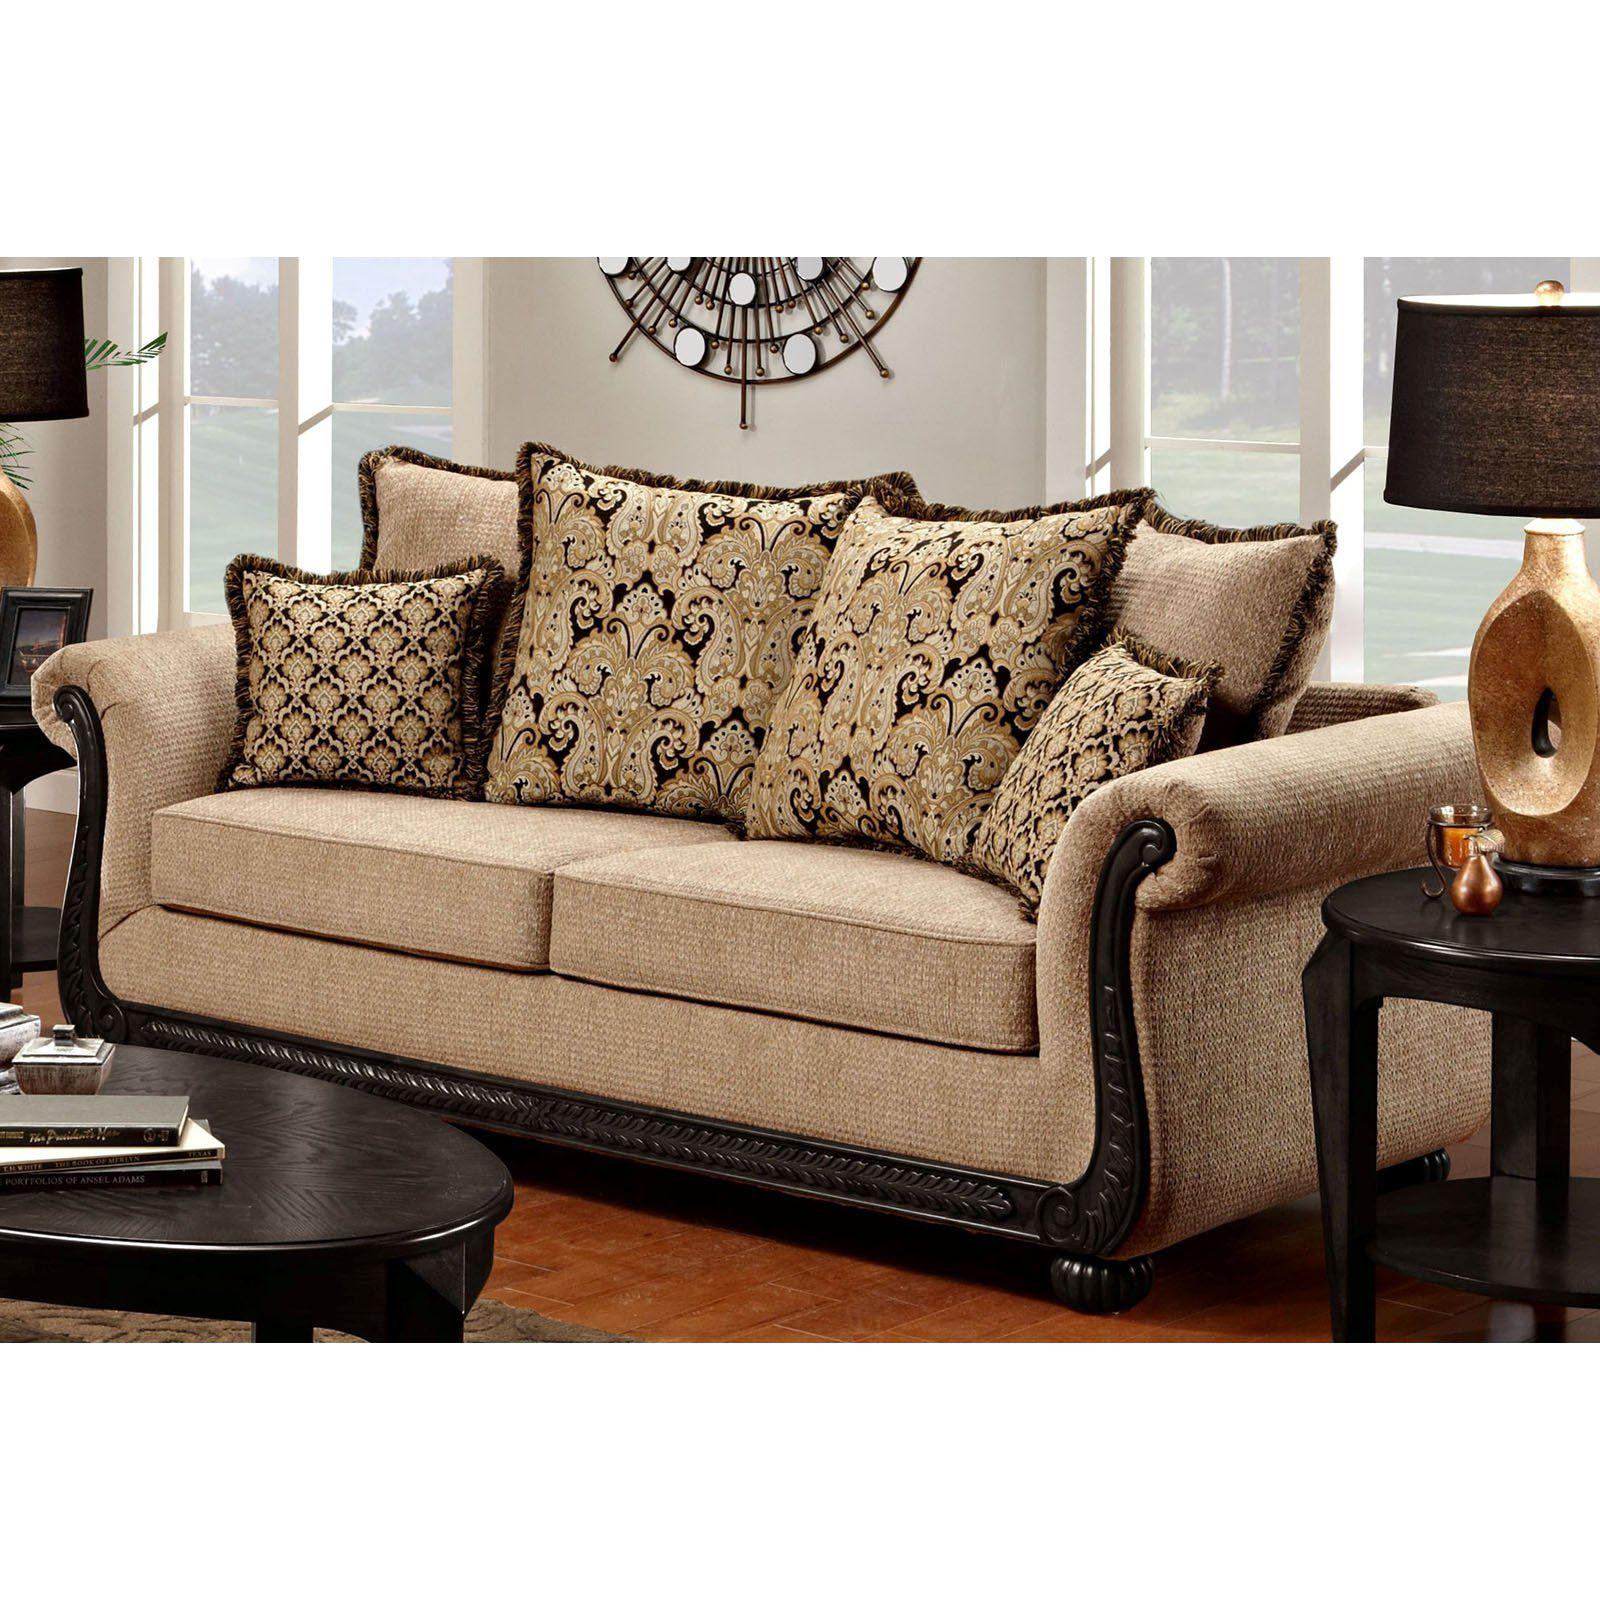 Chelsea Home Furniture Carol Sofa From Hayneedle Com Chelsea